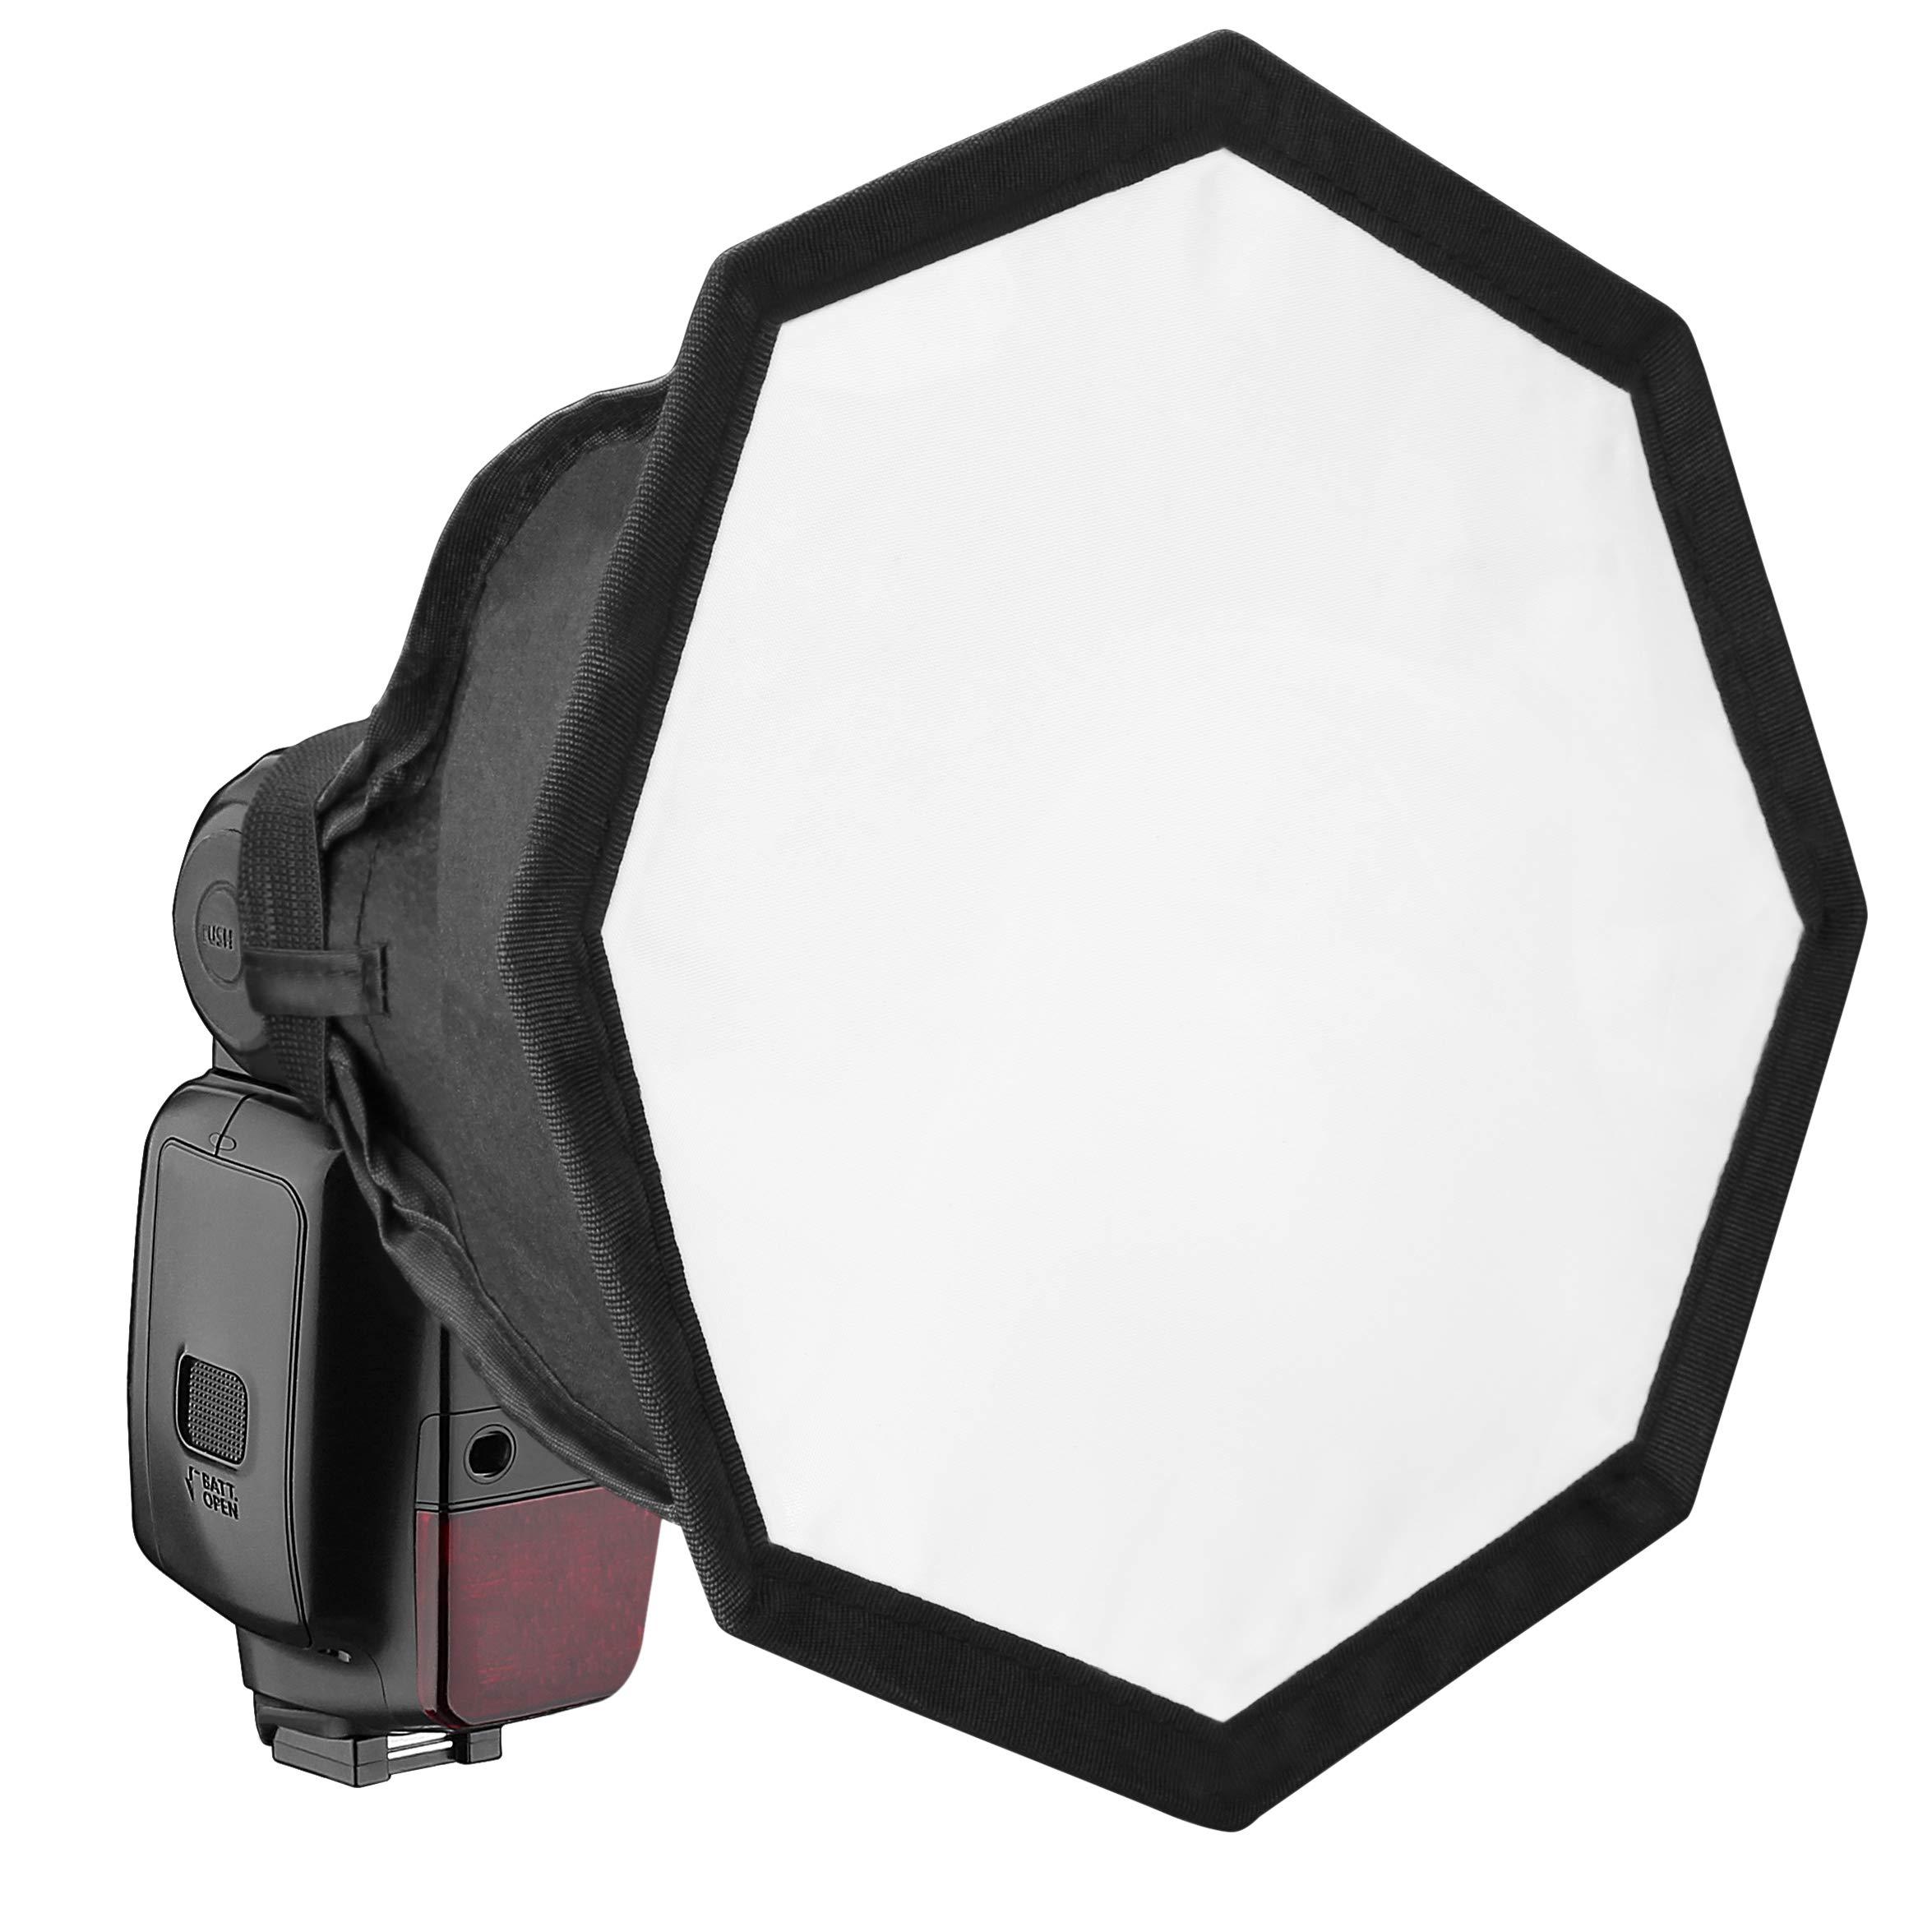 Vello Octa Softbox for Portable Flash (Medium, 8'')